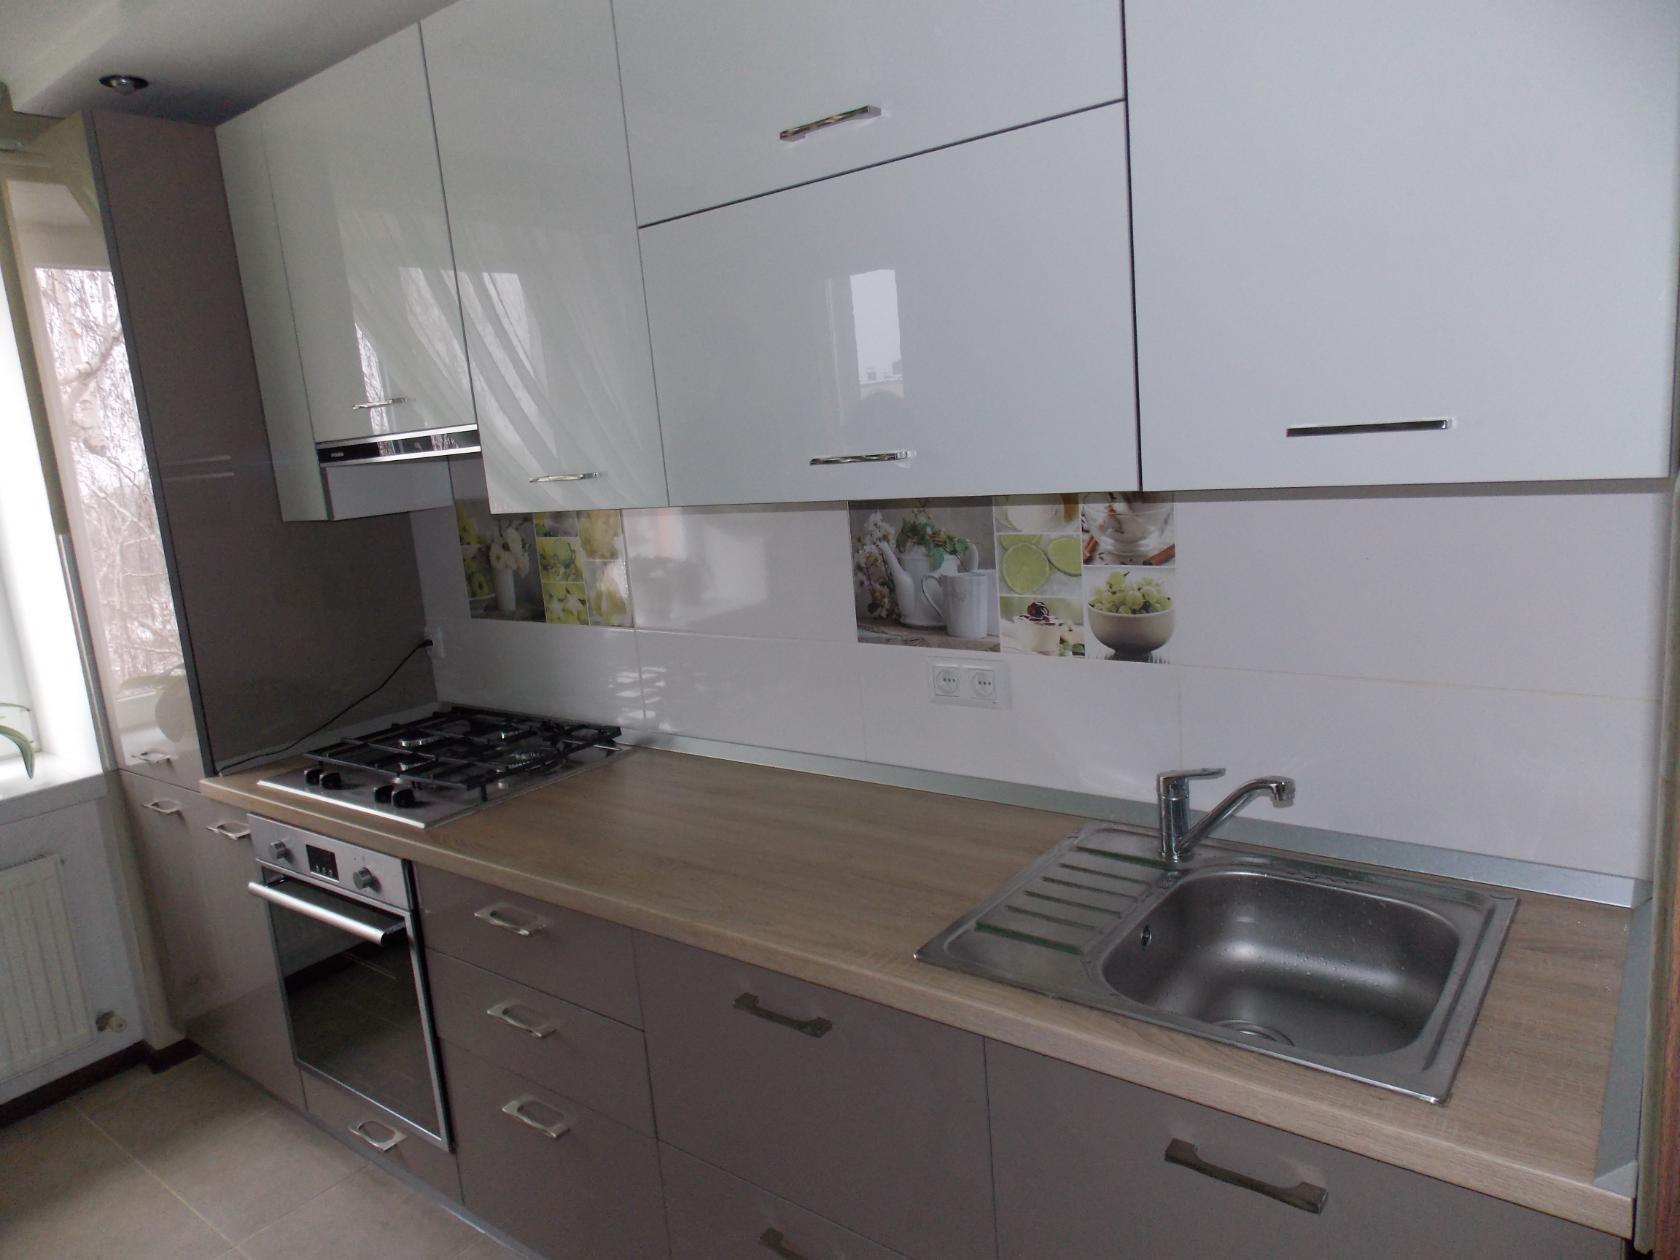 Глянцевая кухня в дизайне (70+ реальных фото)